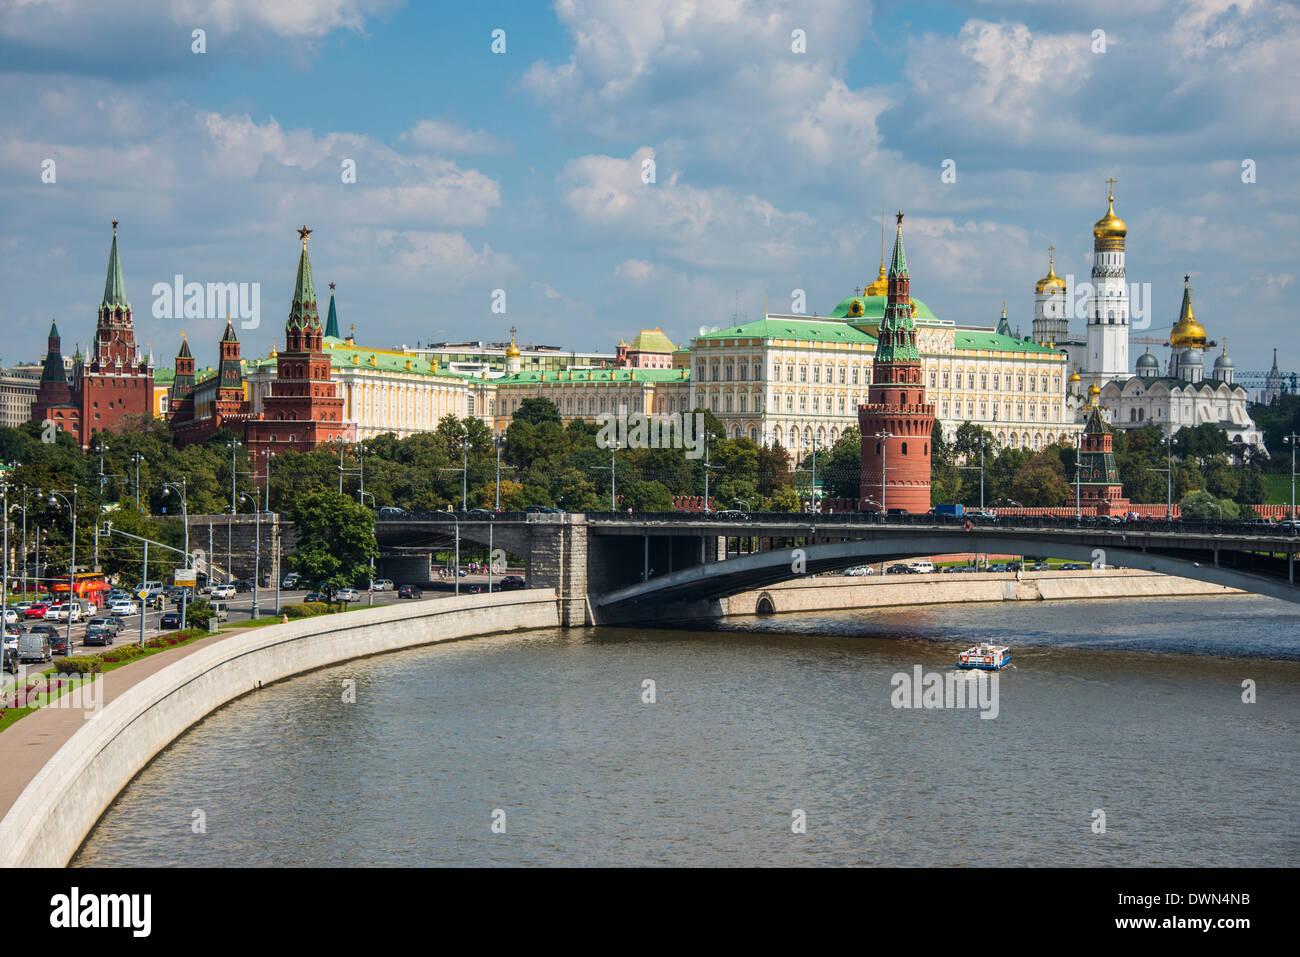 La Moskva (Moscou) et du Kremlin, l'UNESCO World Heritage Site, Moscou, Russie, Europe Photo Stock